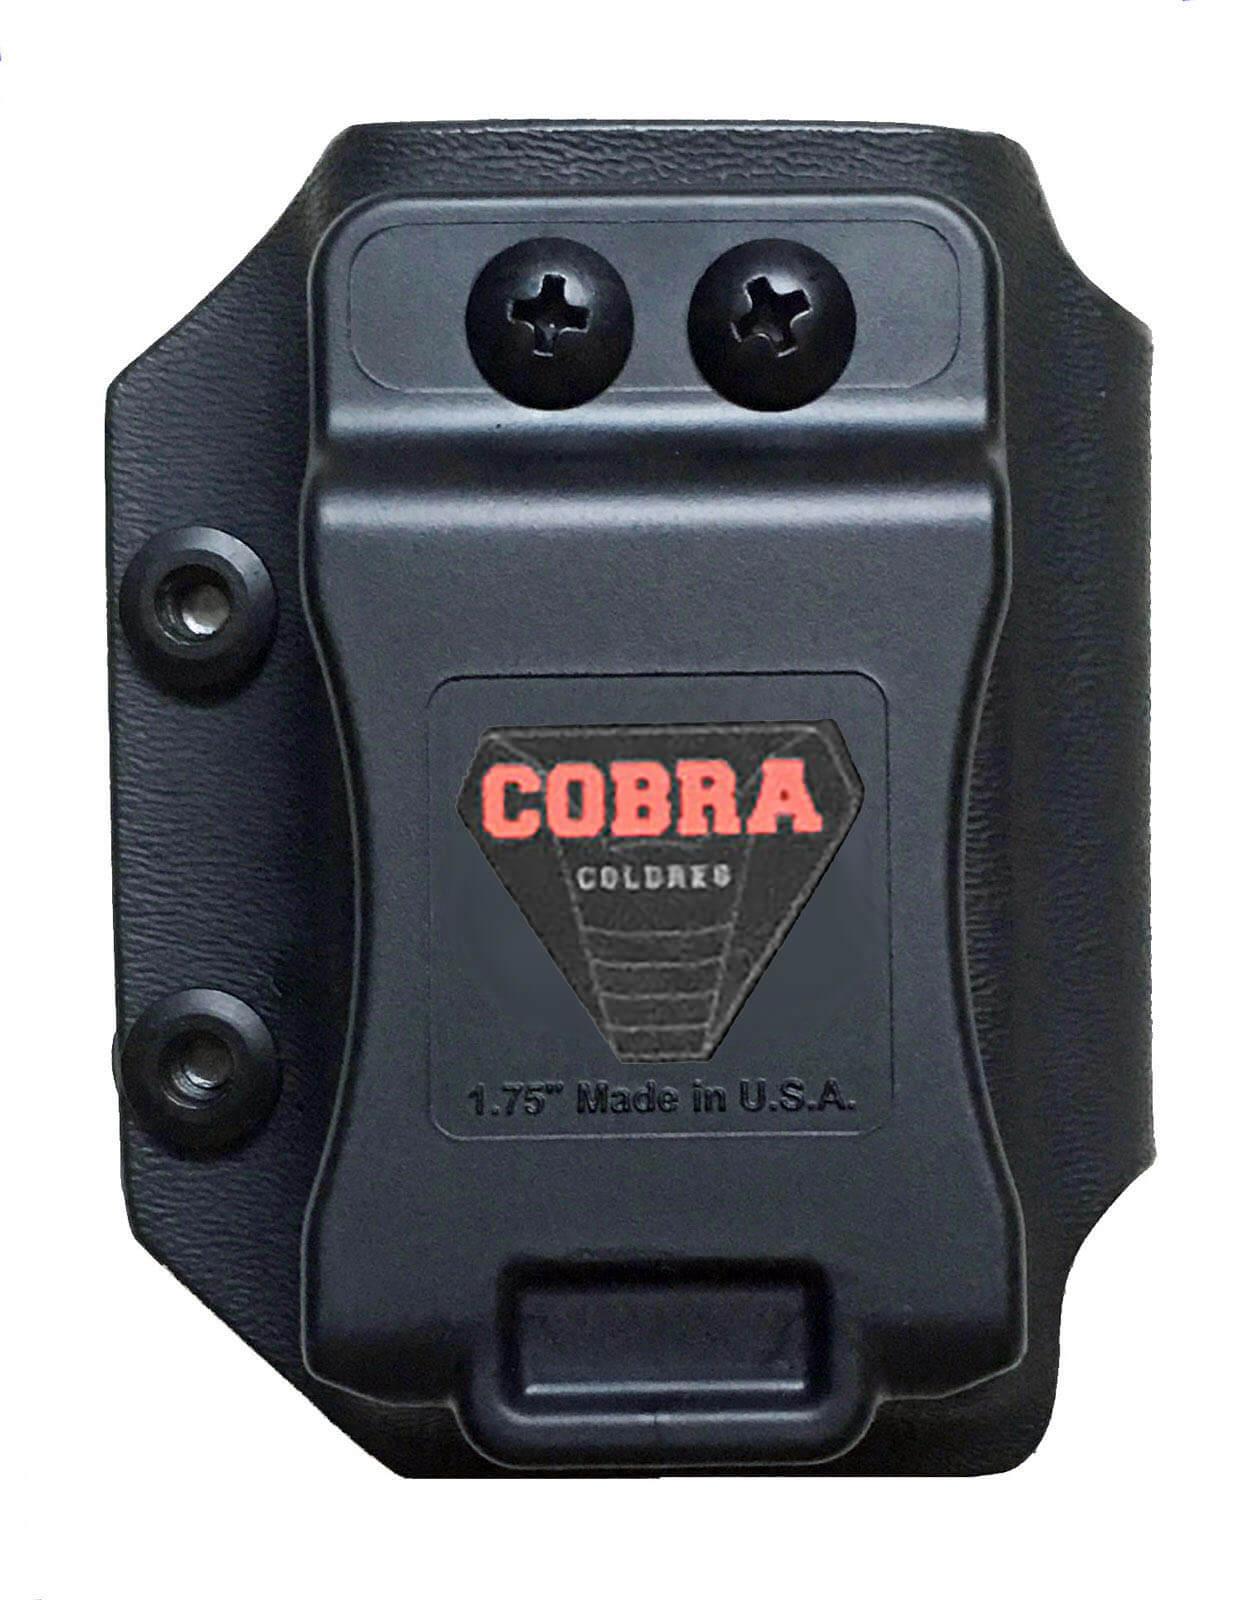 Coldre [G2c 9mm] Kydex Com Flap + 2 Porta-Carregadores Saque Rápido Velado Kydex®